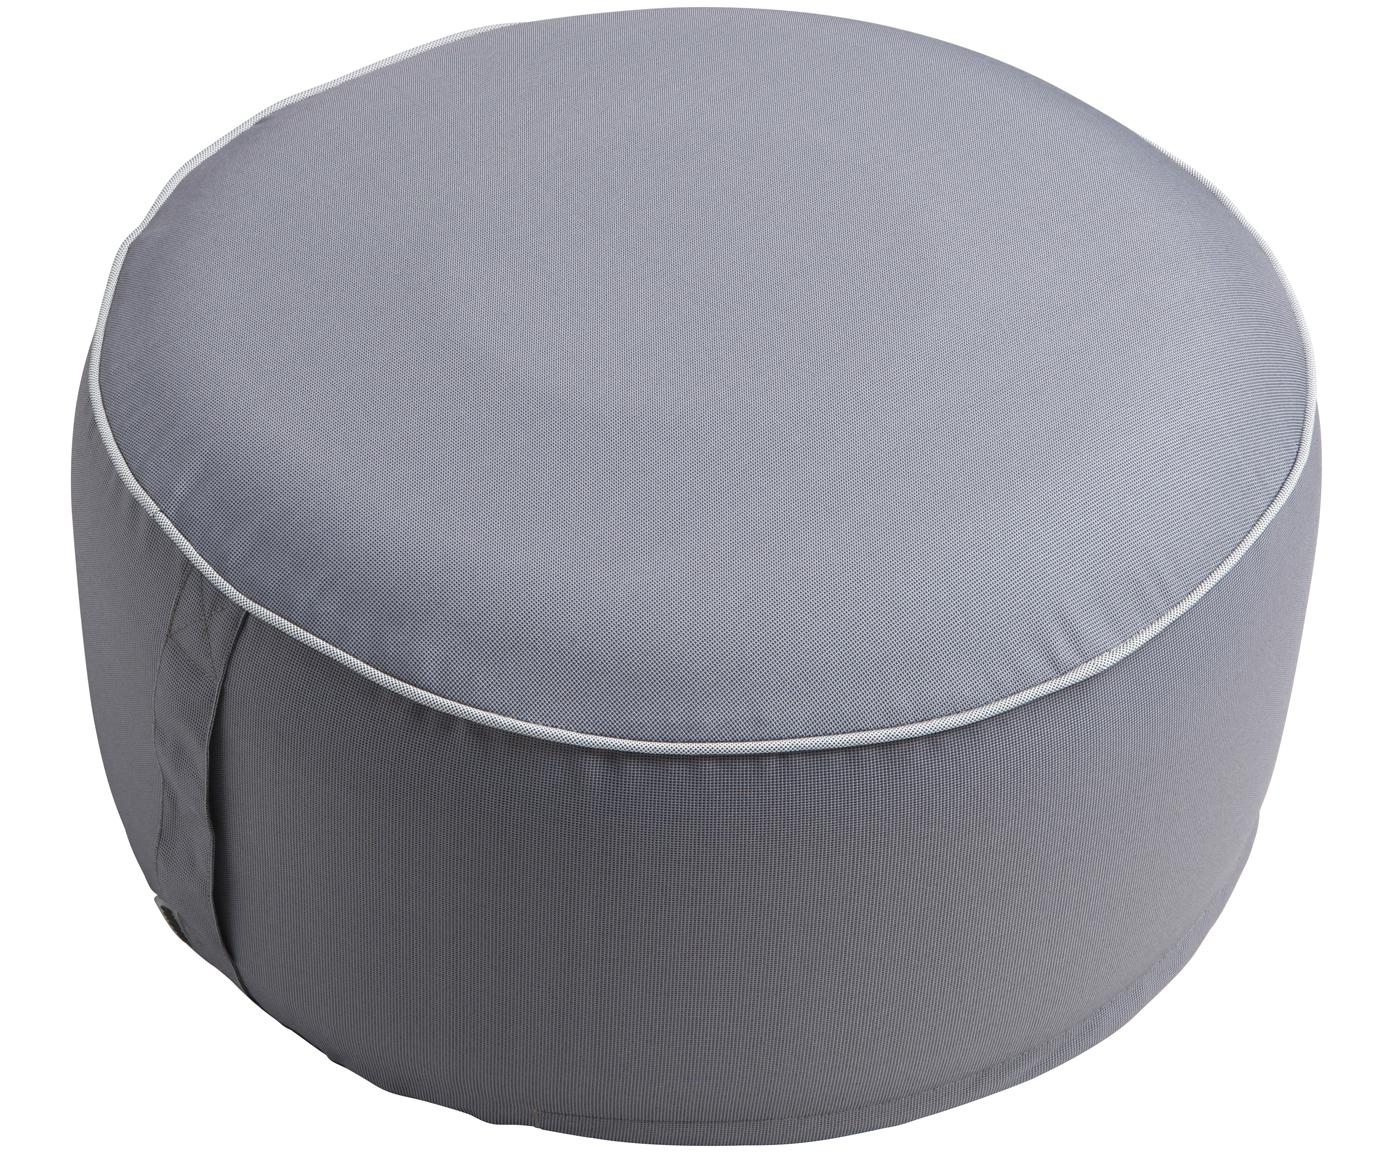 Puf de exterior Maxime, Funda: poliéster, resistente a l, Gris oscuro, blanco, Ø 55 x Al 25 cm